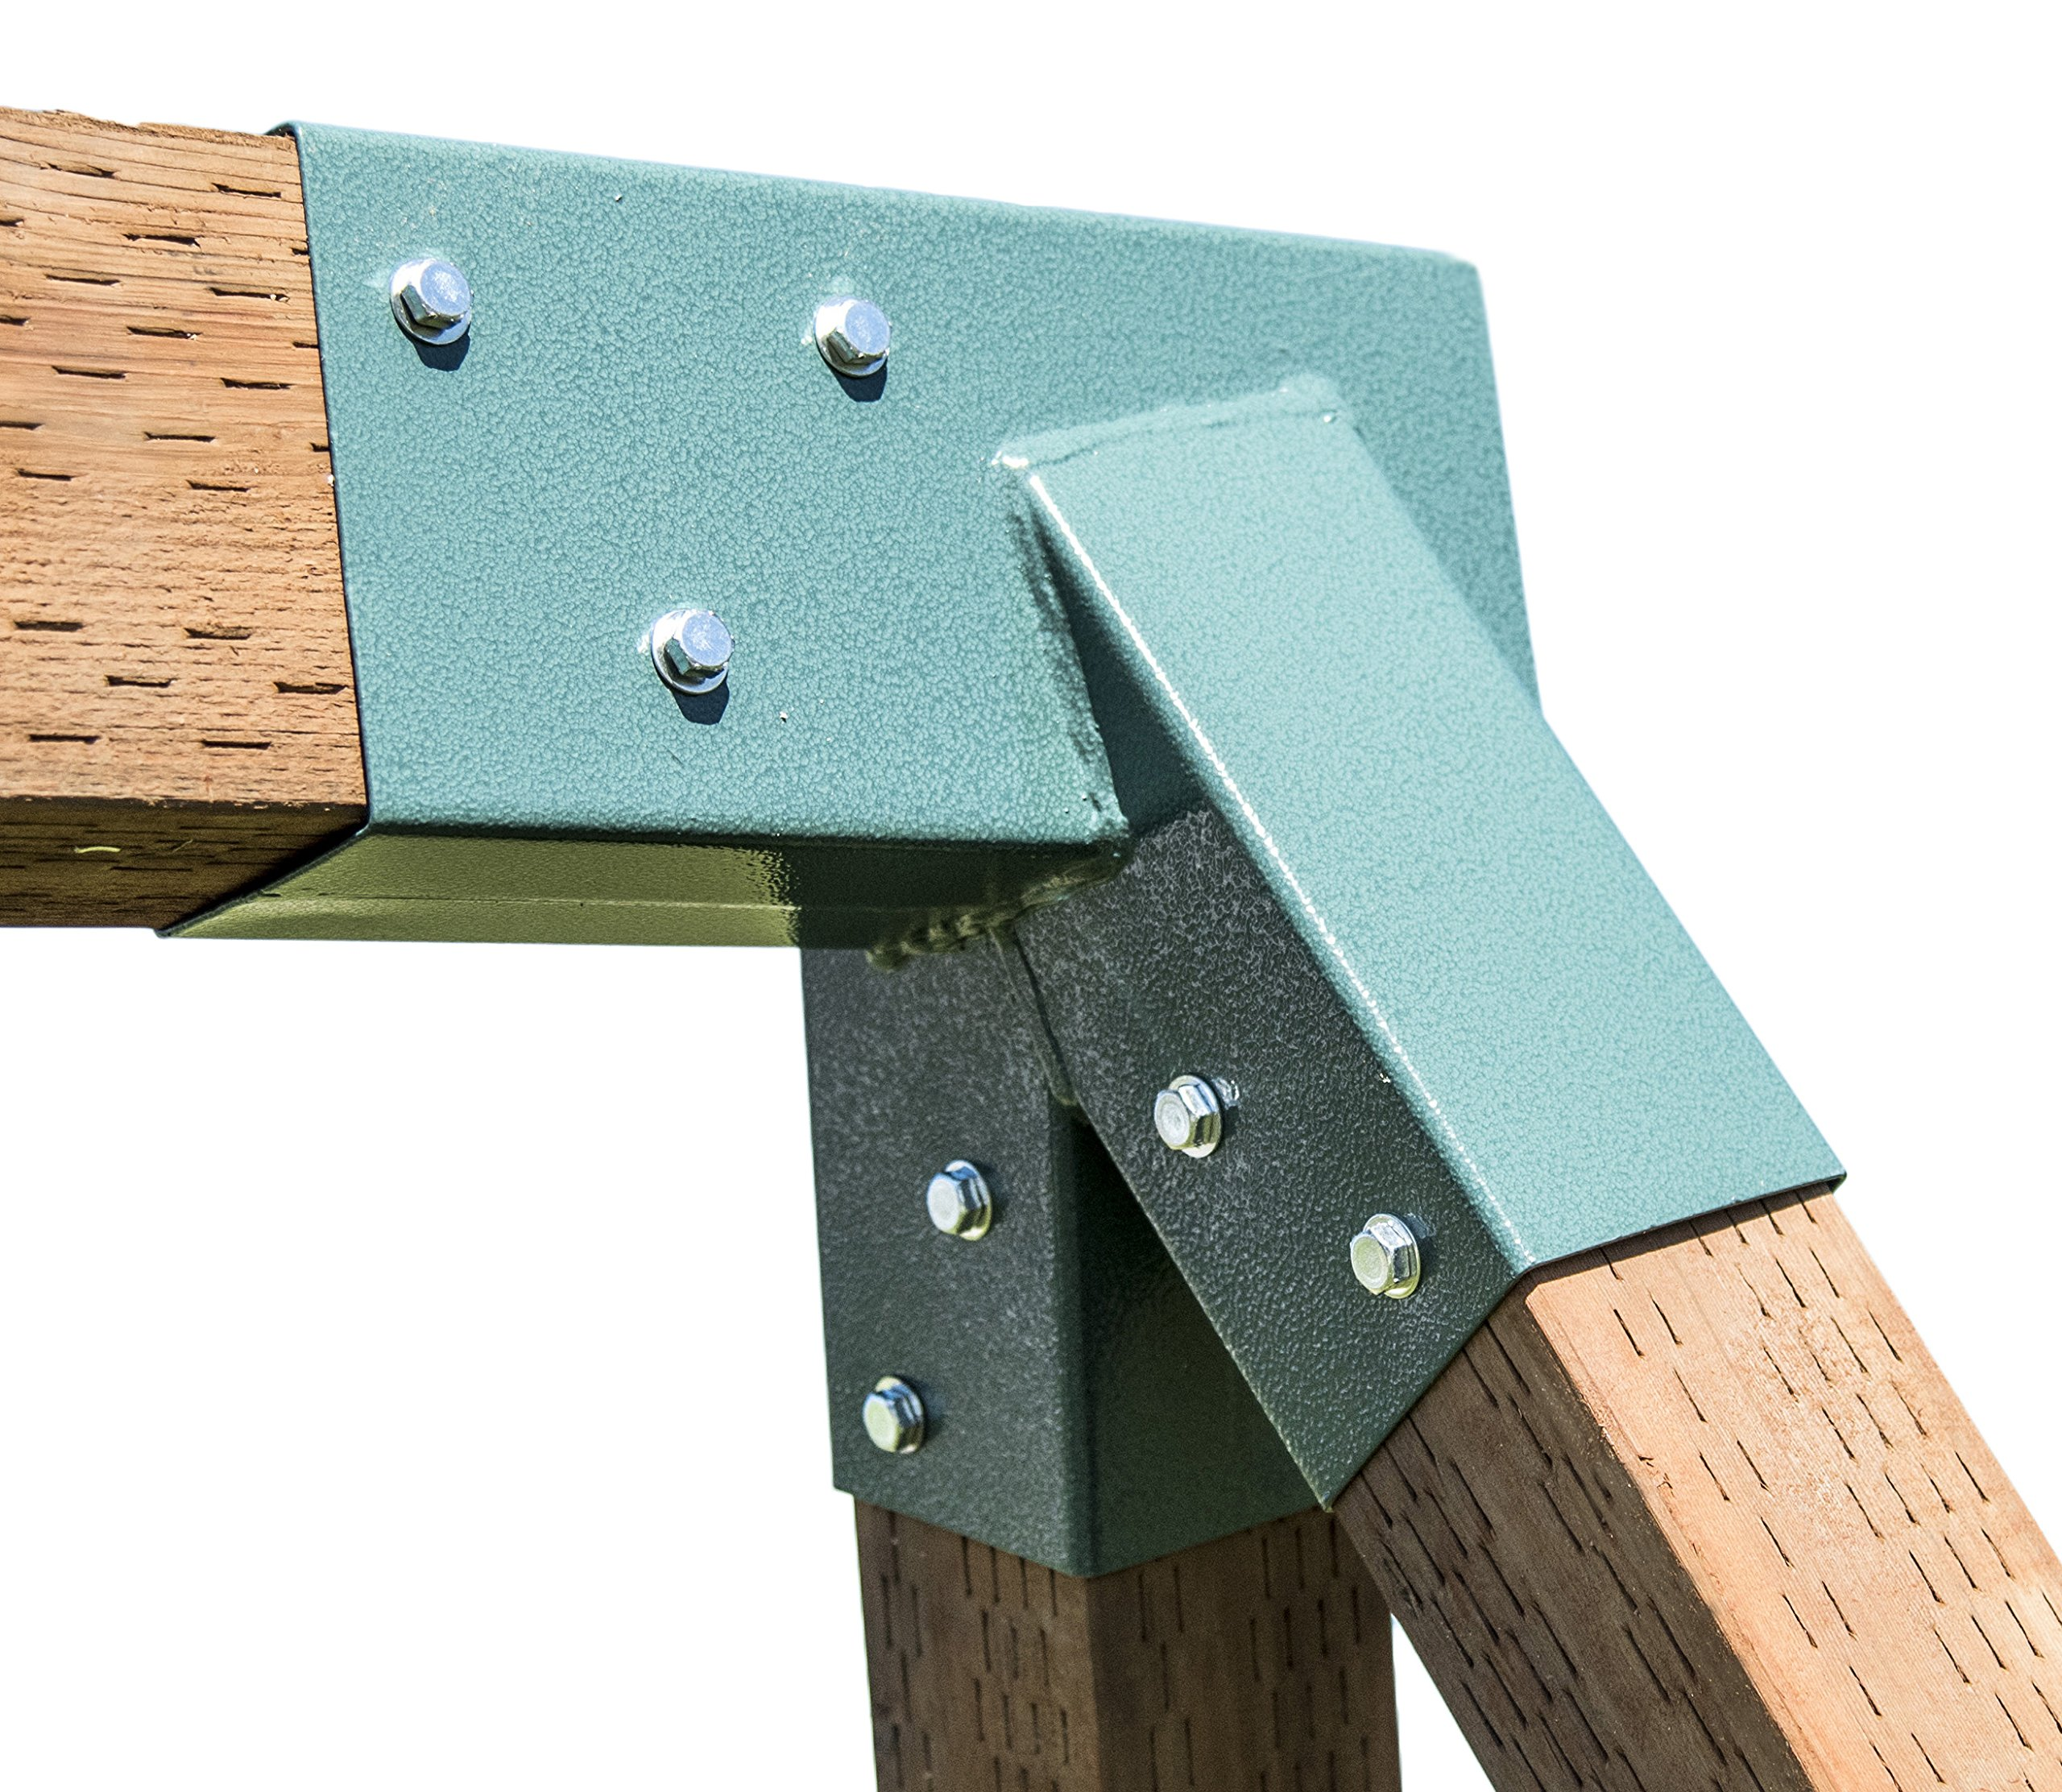 A-Frame Swing Set Bracket - For 2 (4X4) Legs & 1 (4X6) Beam ...